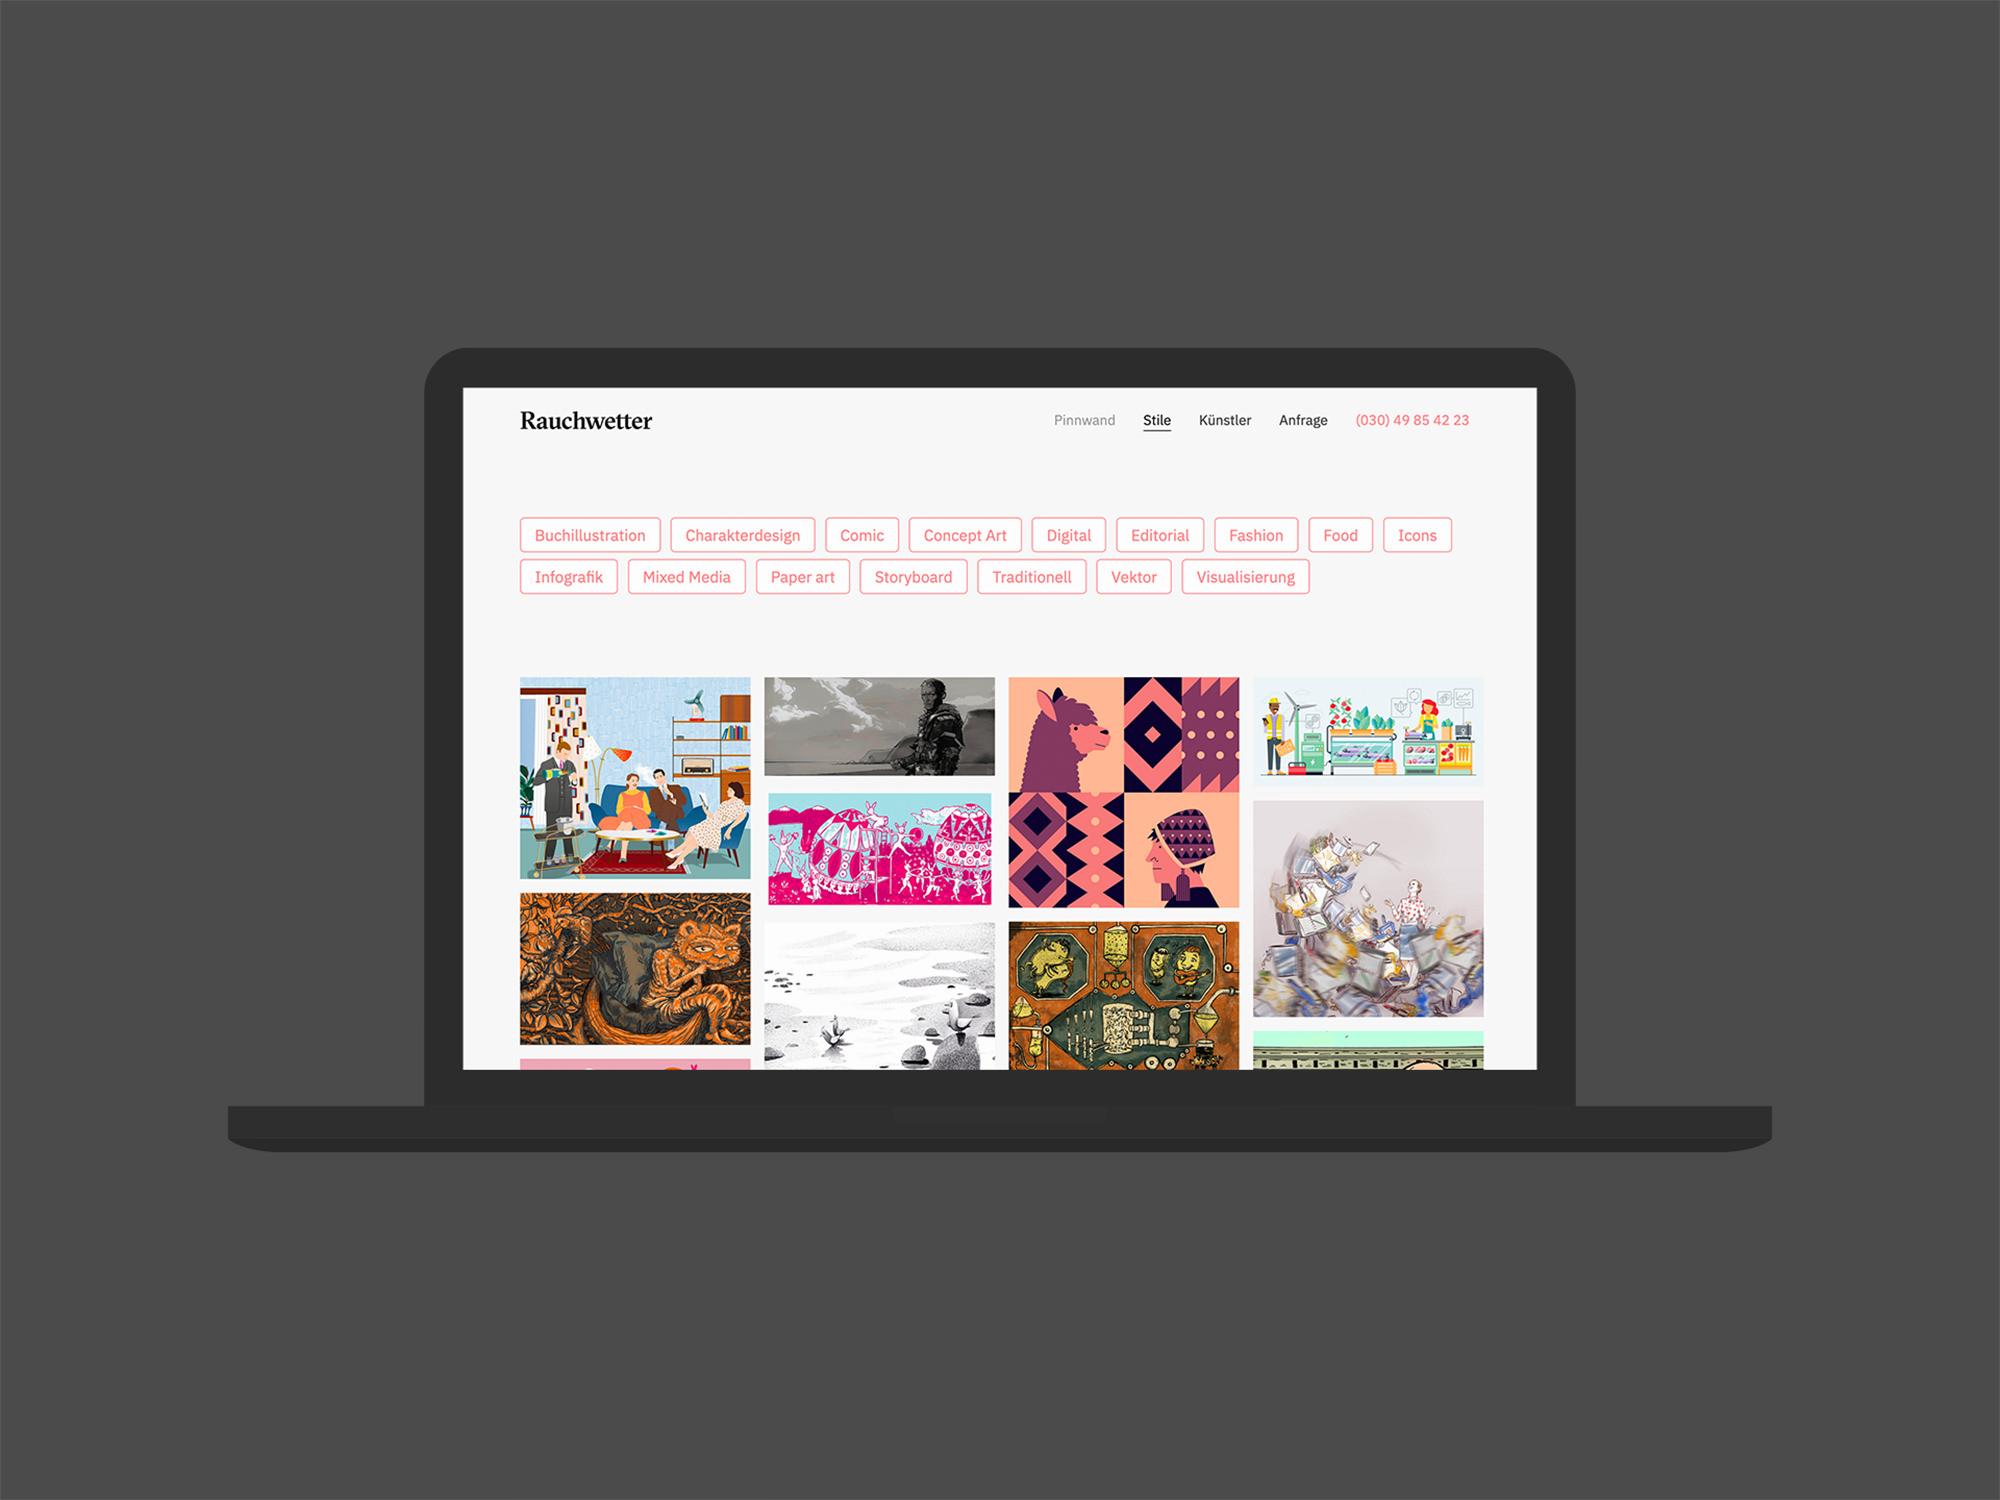 Web 03 (Rauchwetter, Corporate Design)